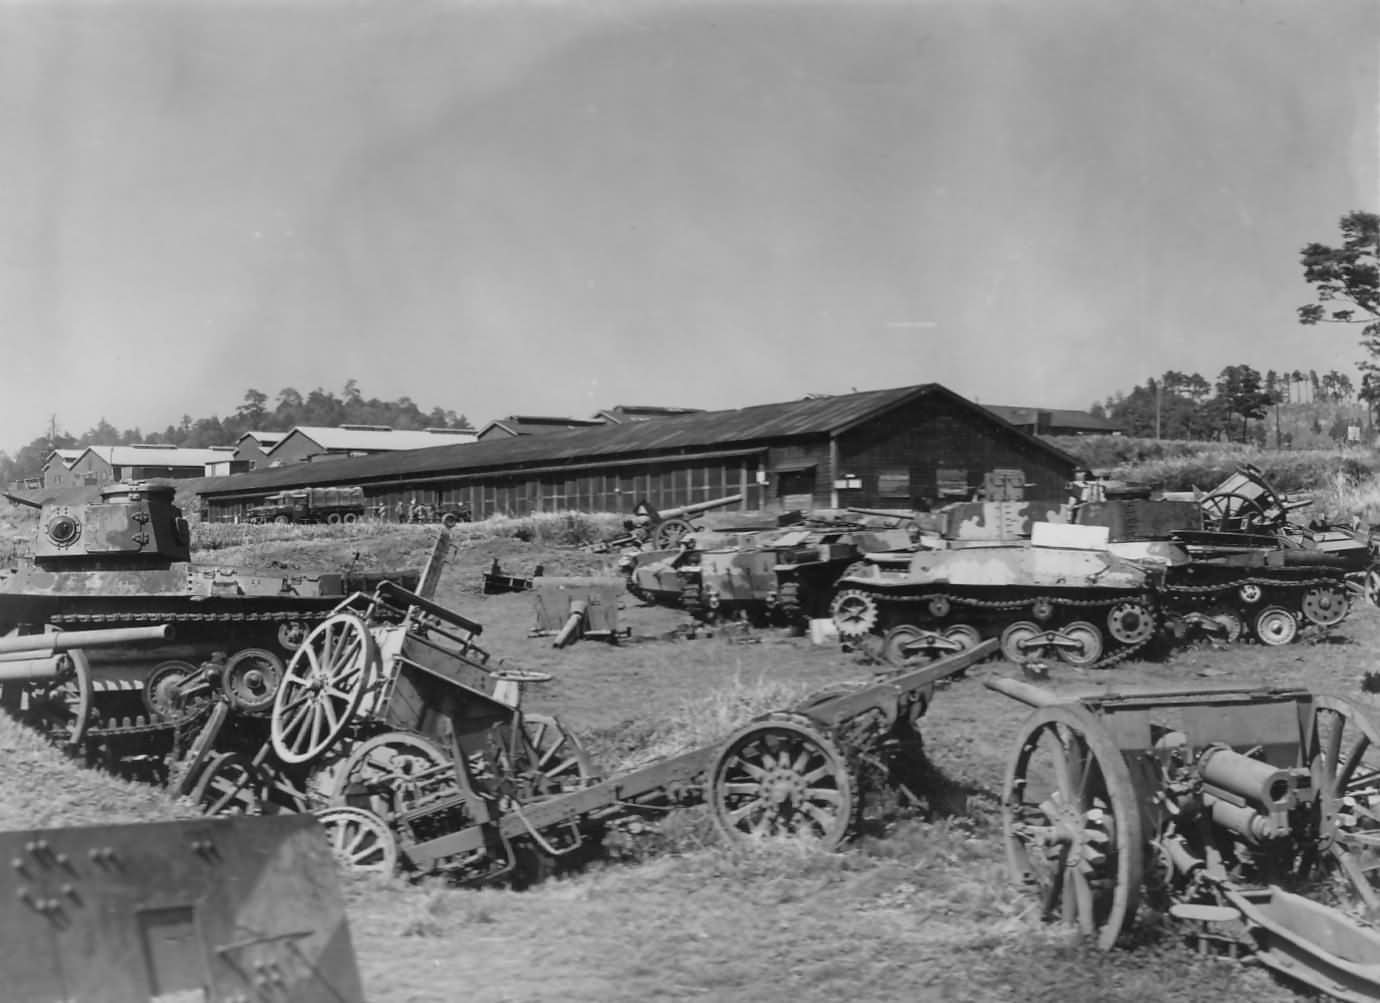 Japanese Type 95 Ha-Go Tanks Wrecks and Artillery in Japan 1945